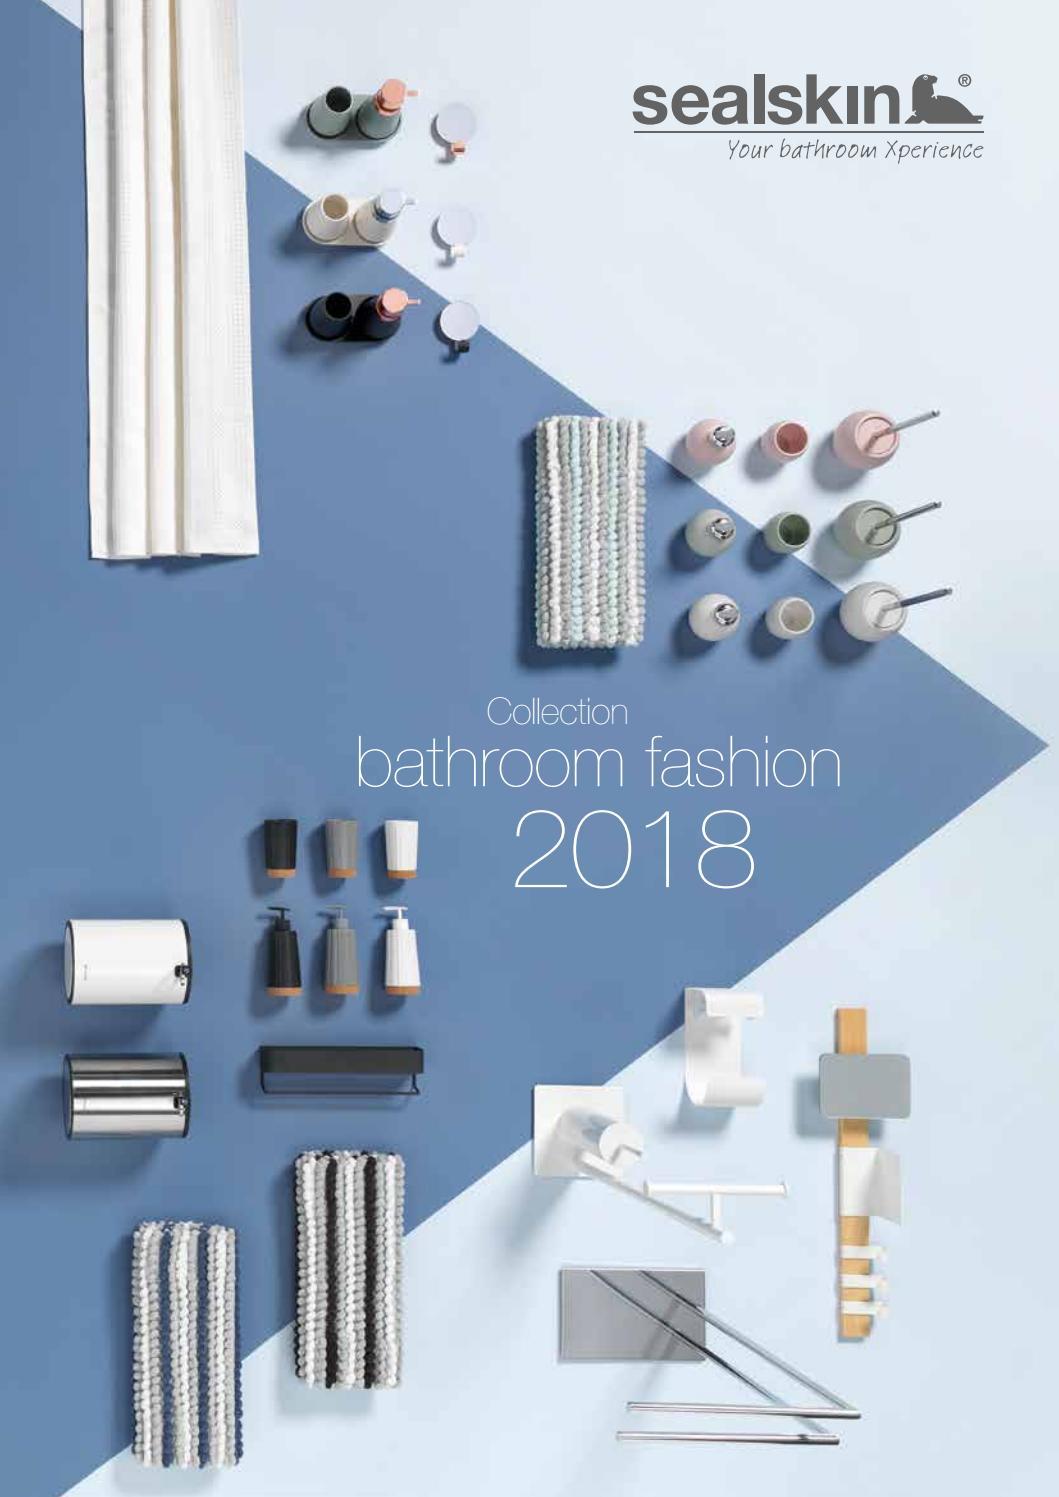 Sealskin bathroom fashion catalogue by Sealskin - issuu